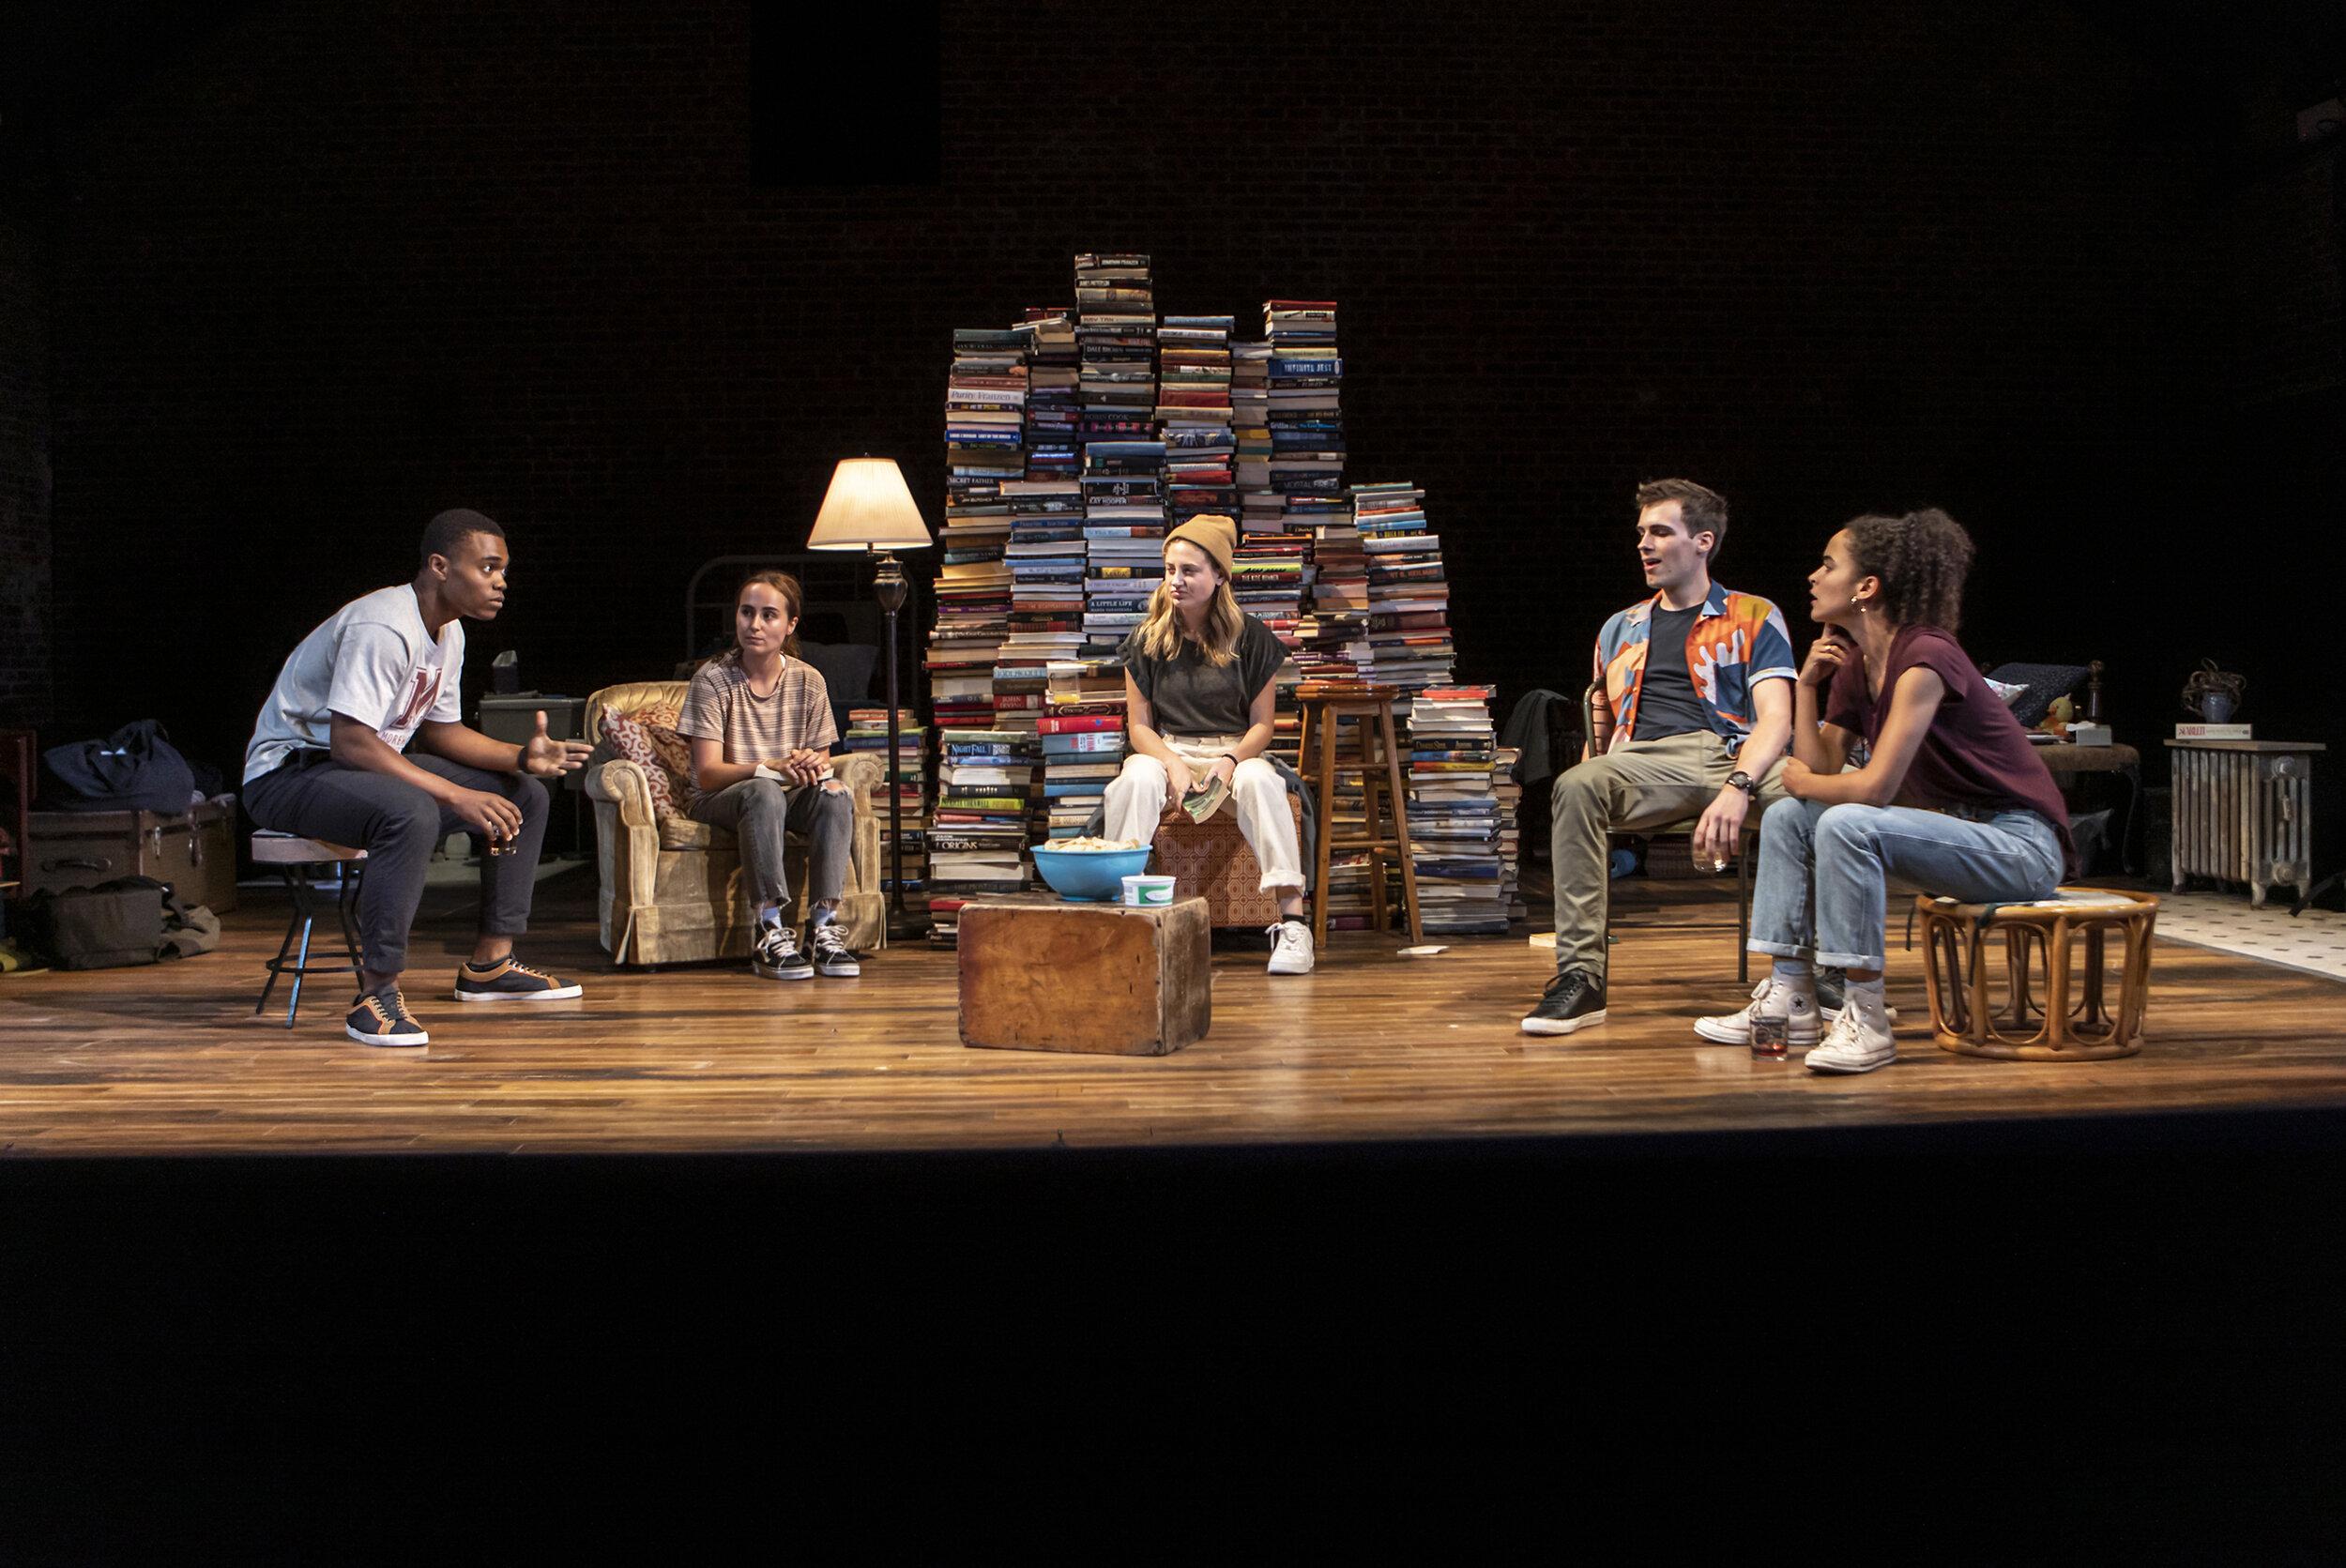 "Christian Strange, Sadie Scott, Ruby Frankel, Zane Pais, and Juliana Canfield in ""Sunday"". Photo Credit: Monique Carboni."